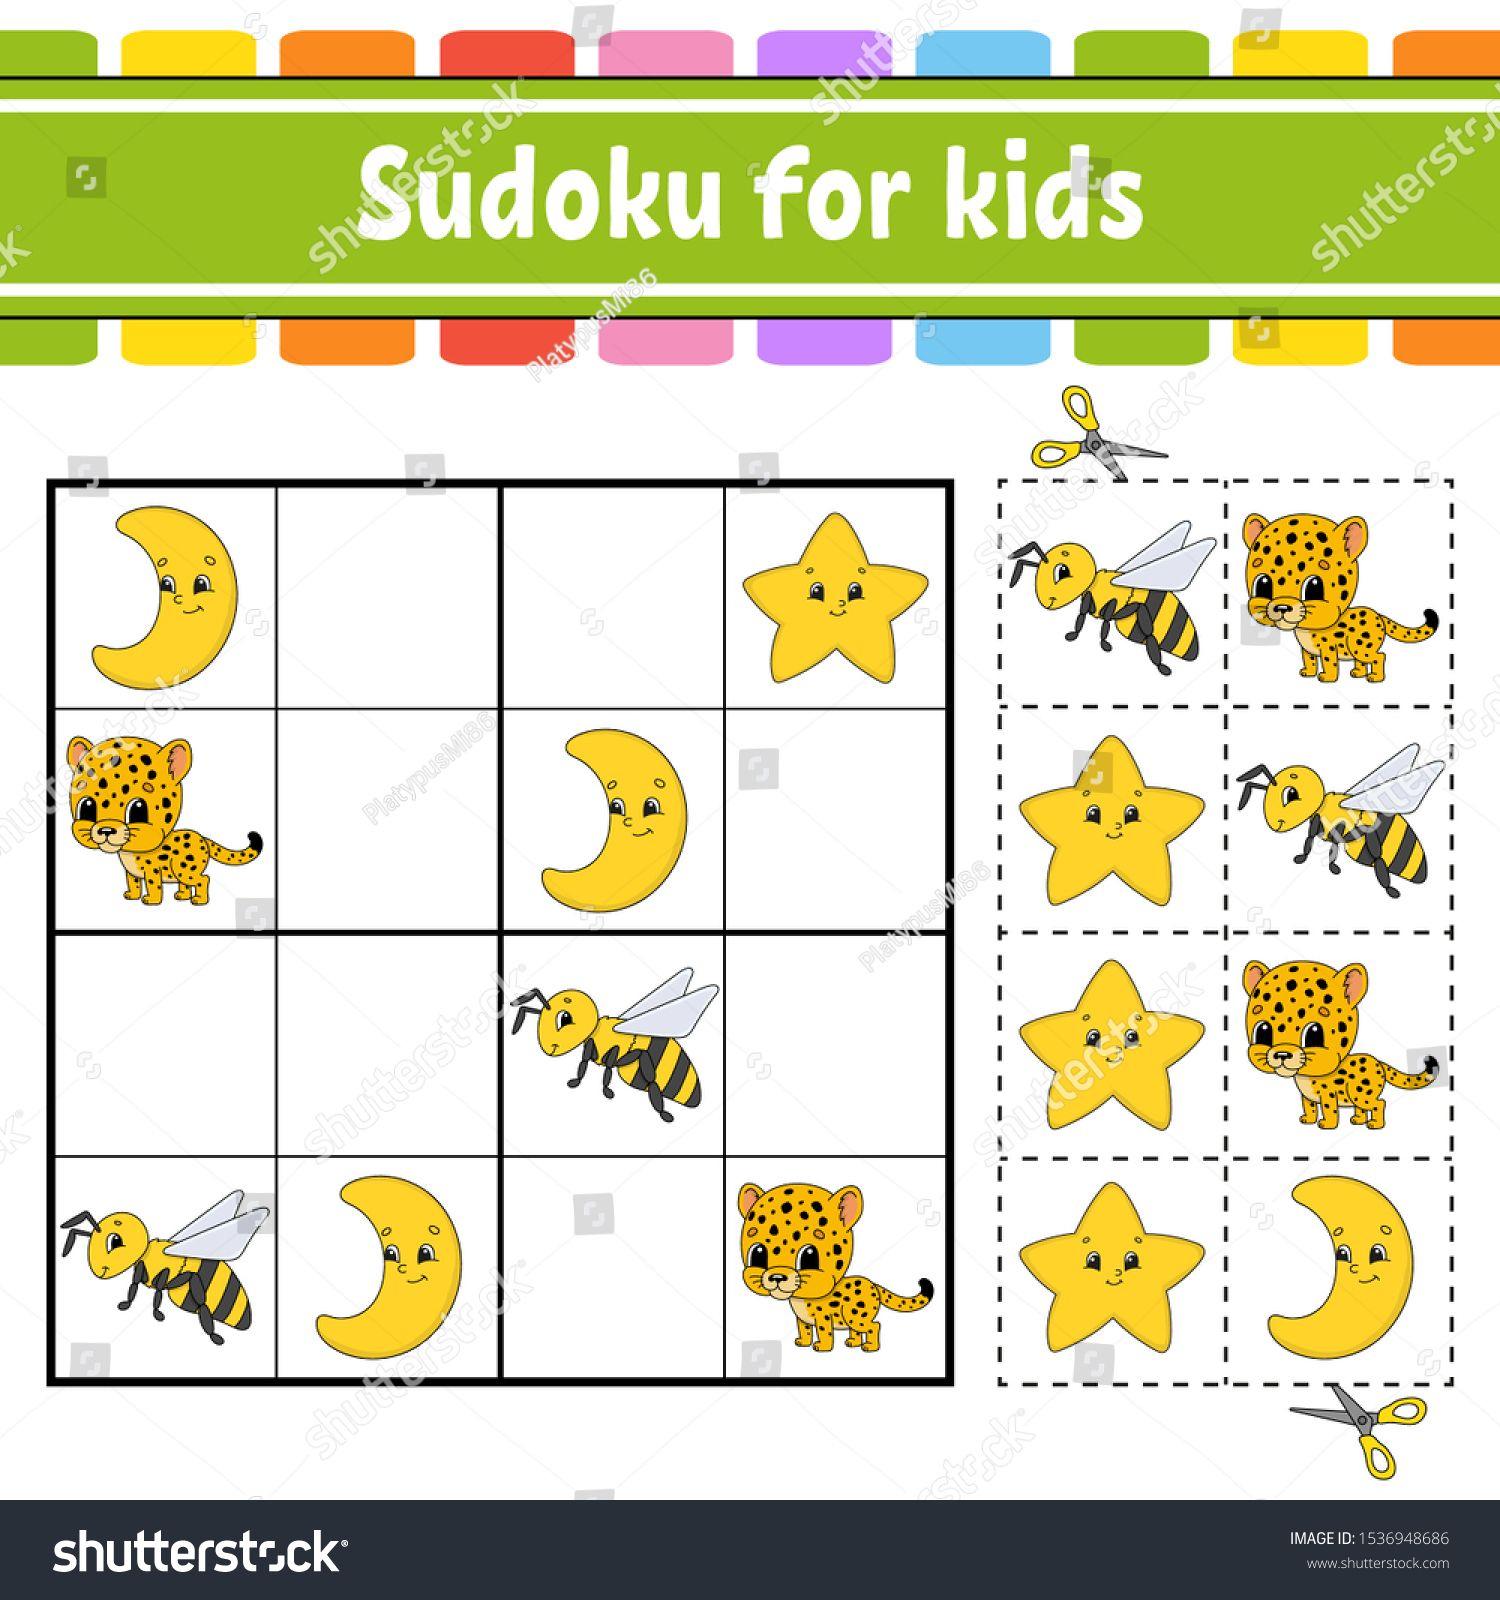 Sudoku For Kids. Education Developing Worksheet. Activity